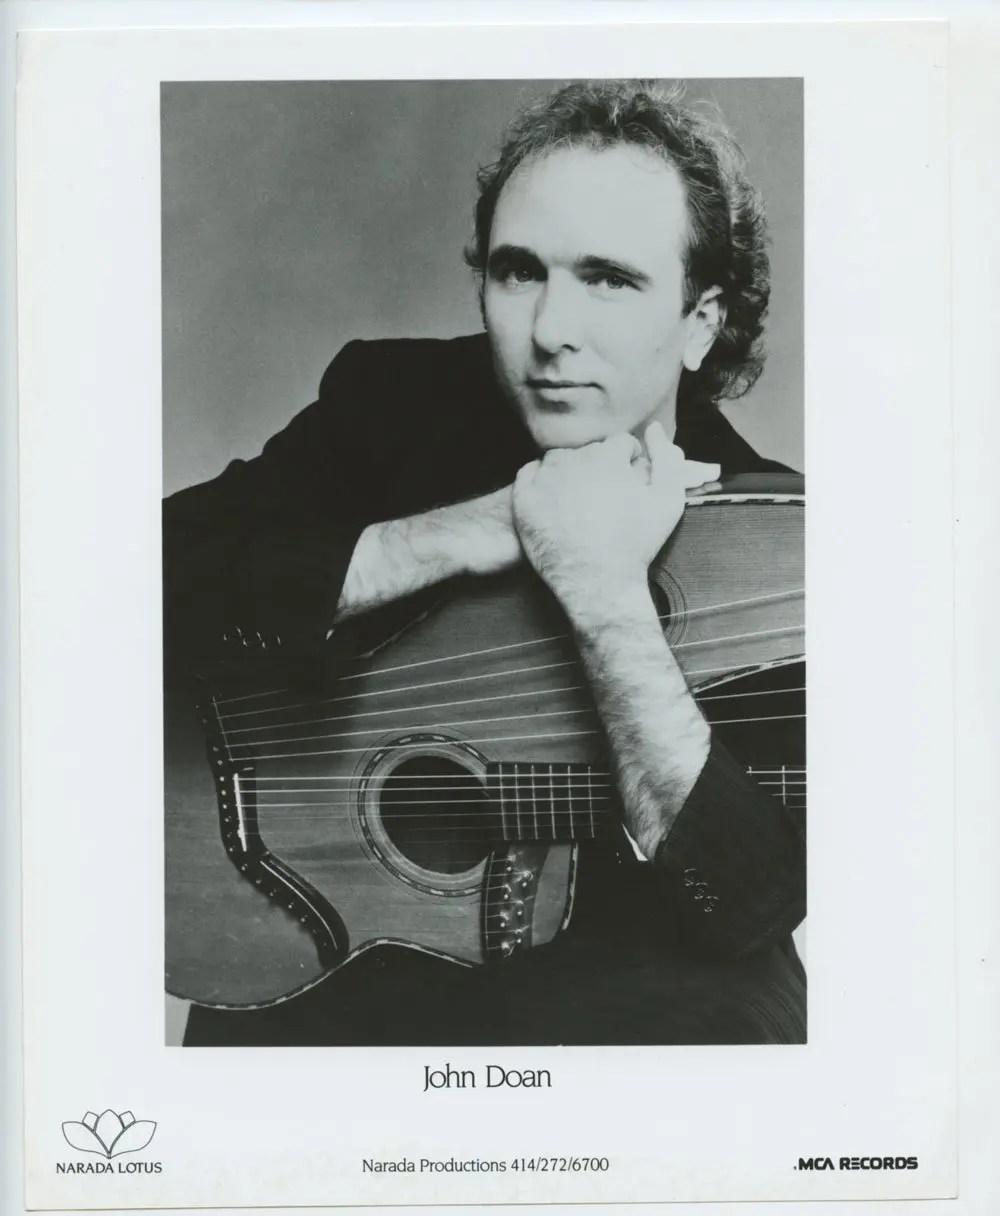 John Doan Photo 1985 Publicity Promo Narada Lotus Records